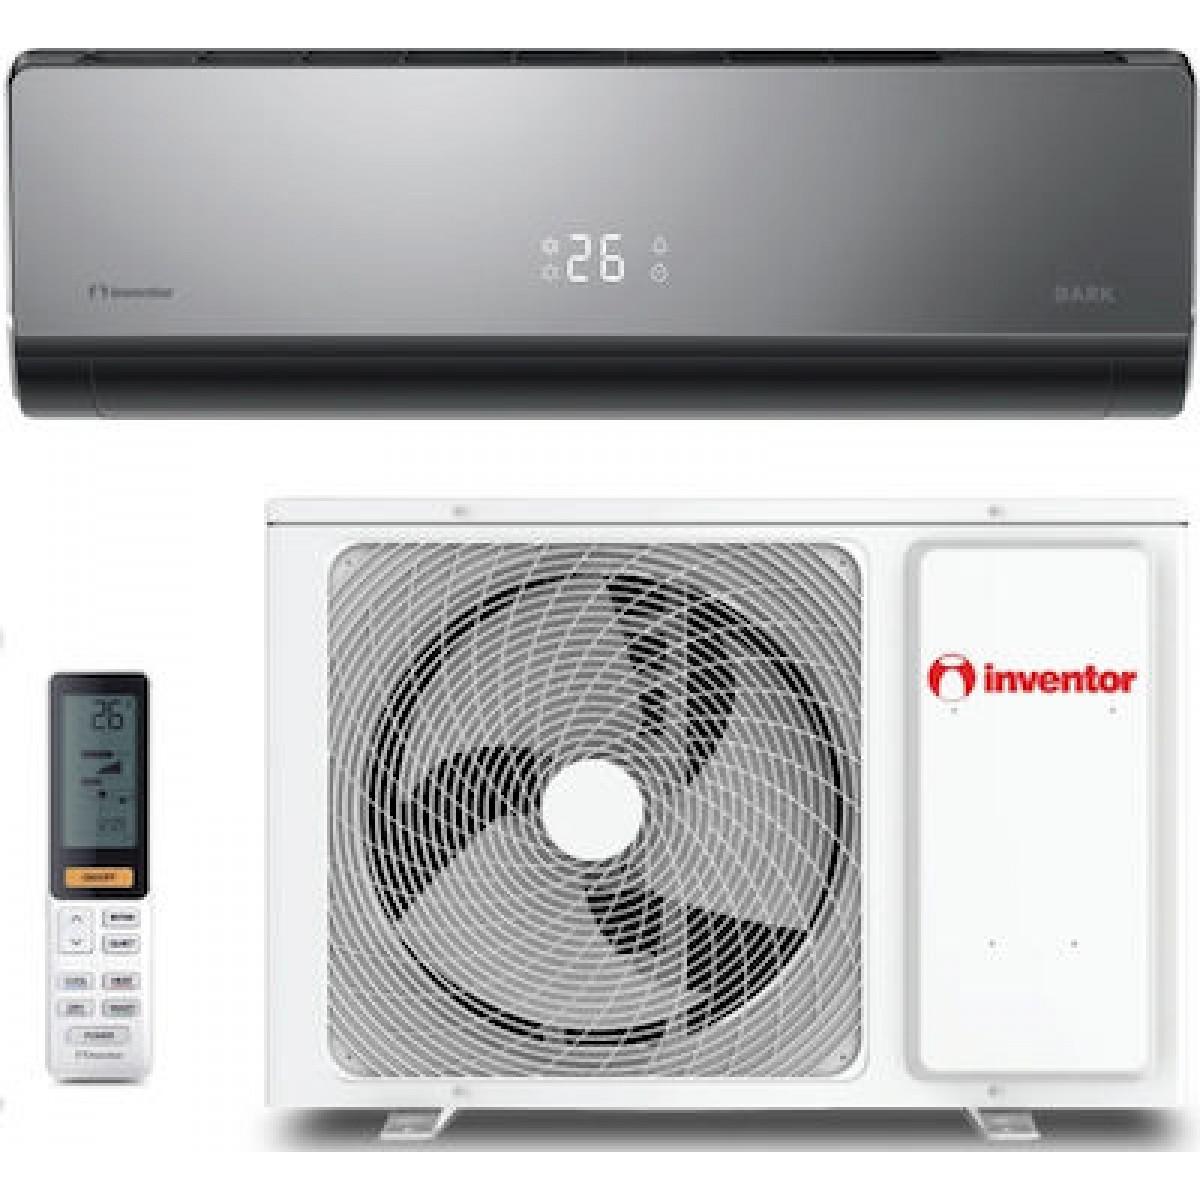 Inventor Dark DRVI32-18WF  Θέρμανση, Κλιματισμός Ηλεκτρικες Συσκευες - homeelectrics.gr